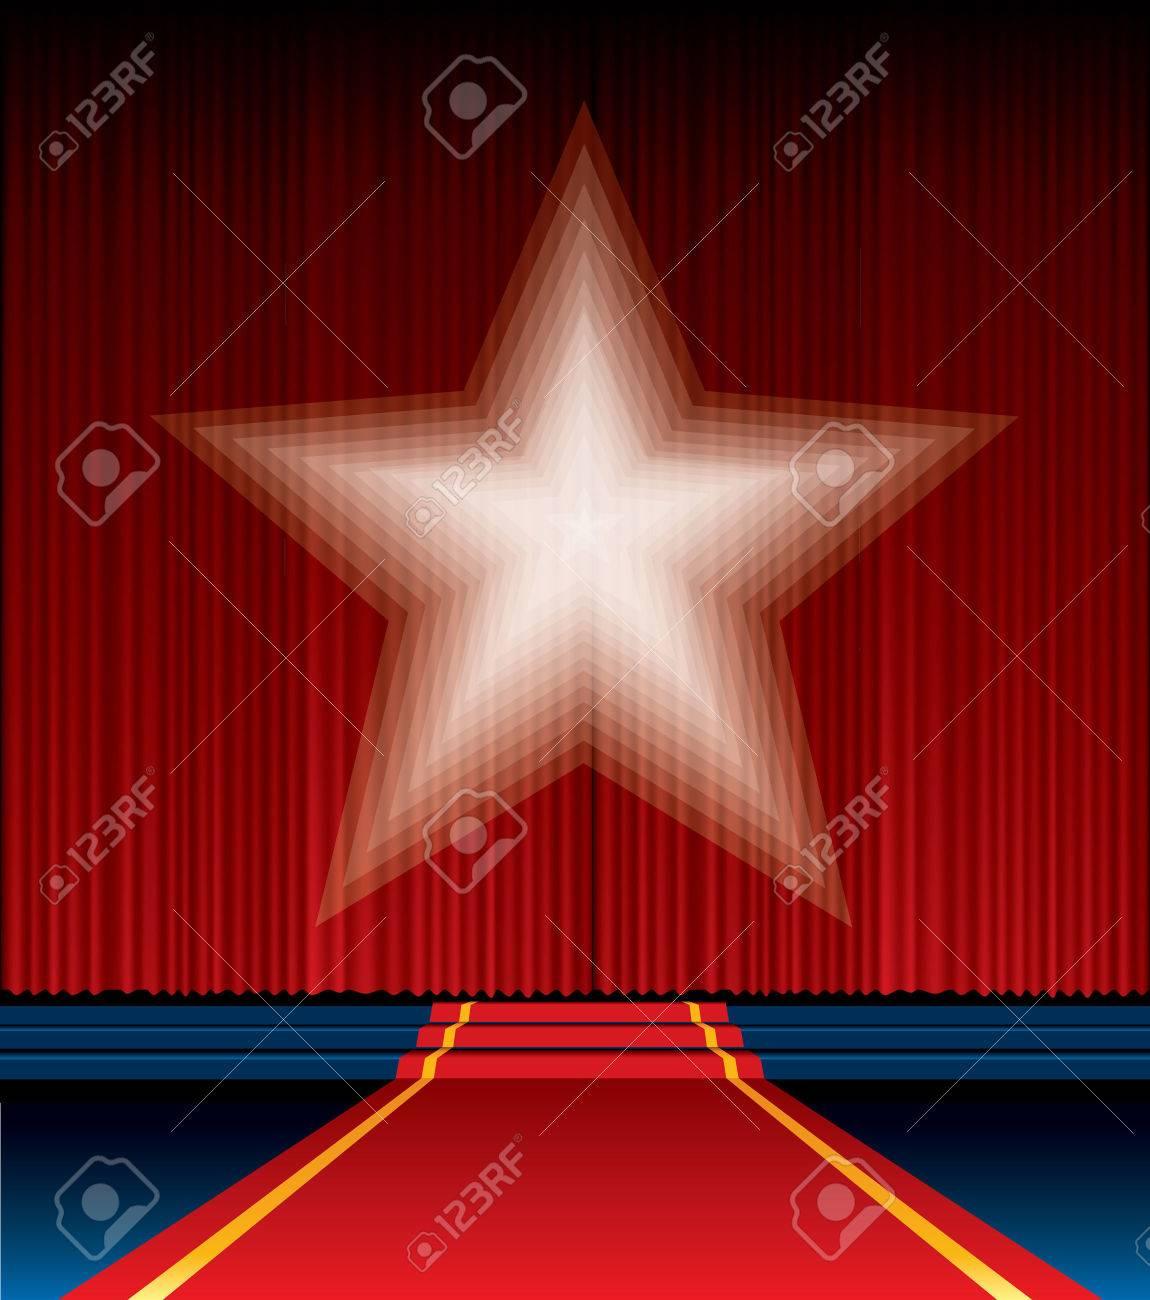 Red curtain spotlight - Vector Red Curtain With Blurry Spotlight Star Stock Vector 24230800